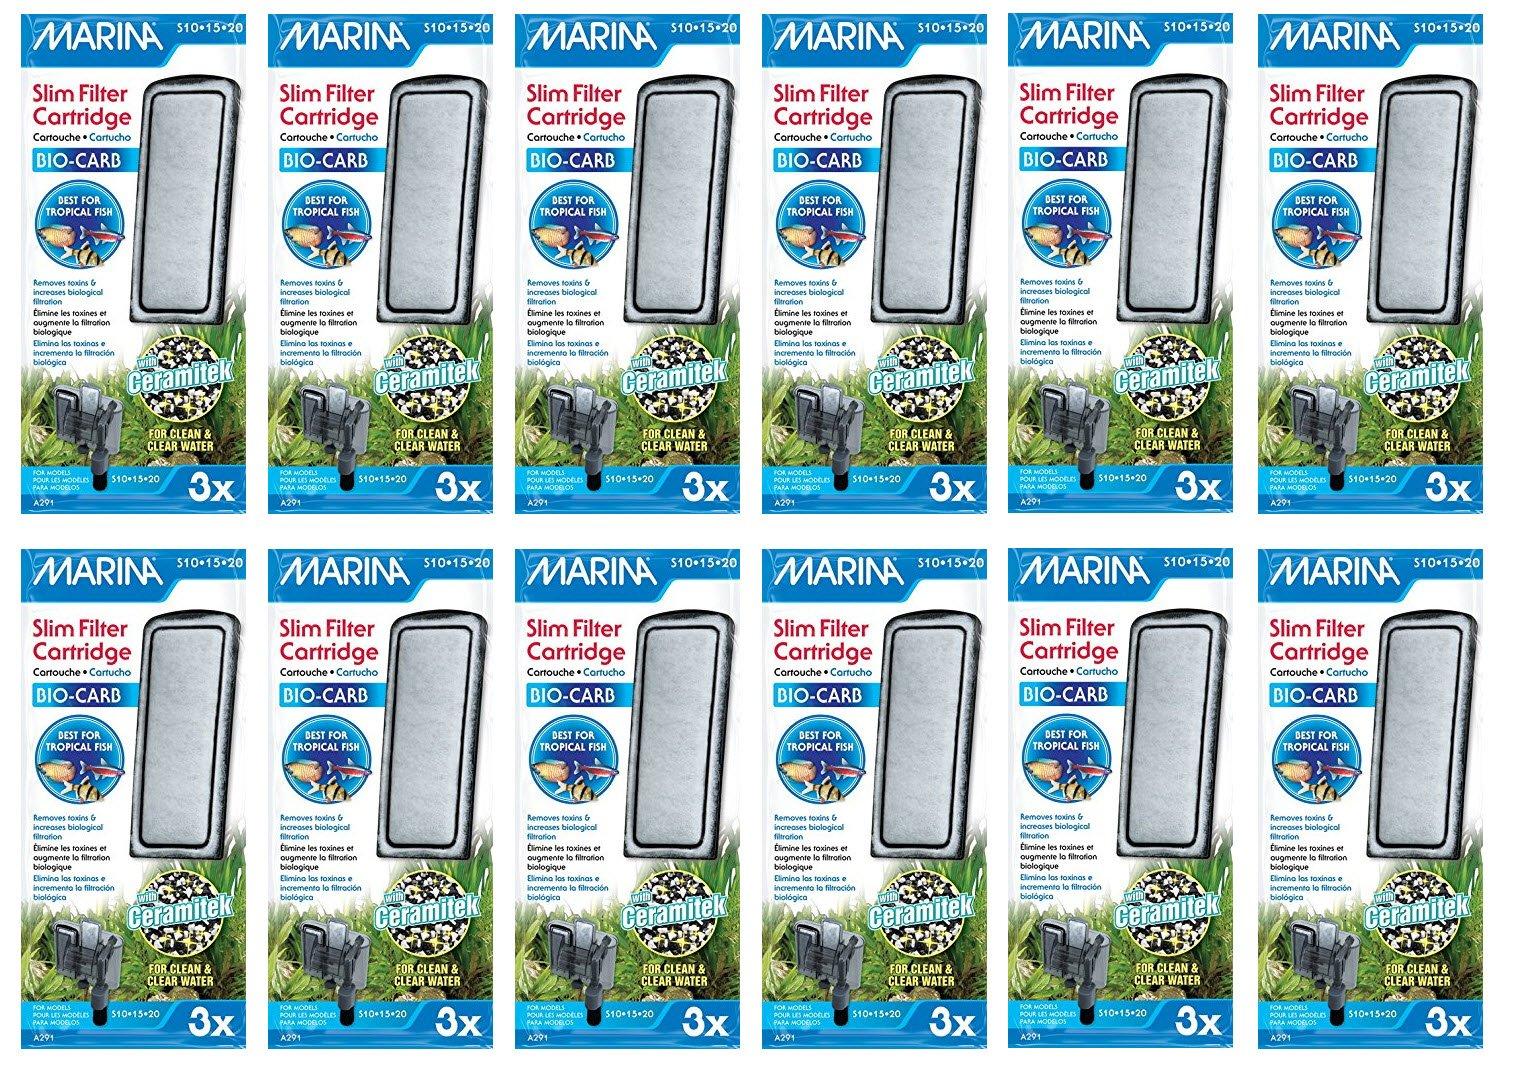 Marina Slim Filter Carbon Plus Ceramic Cartridge, 36-count by Marina